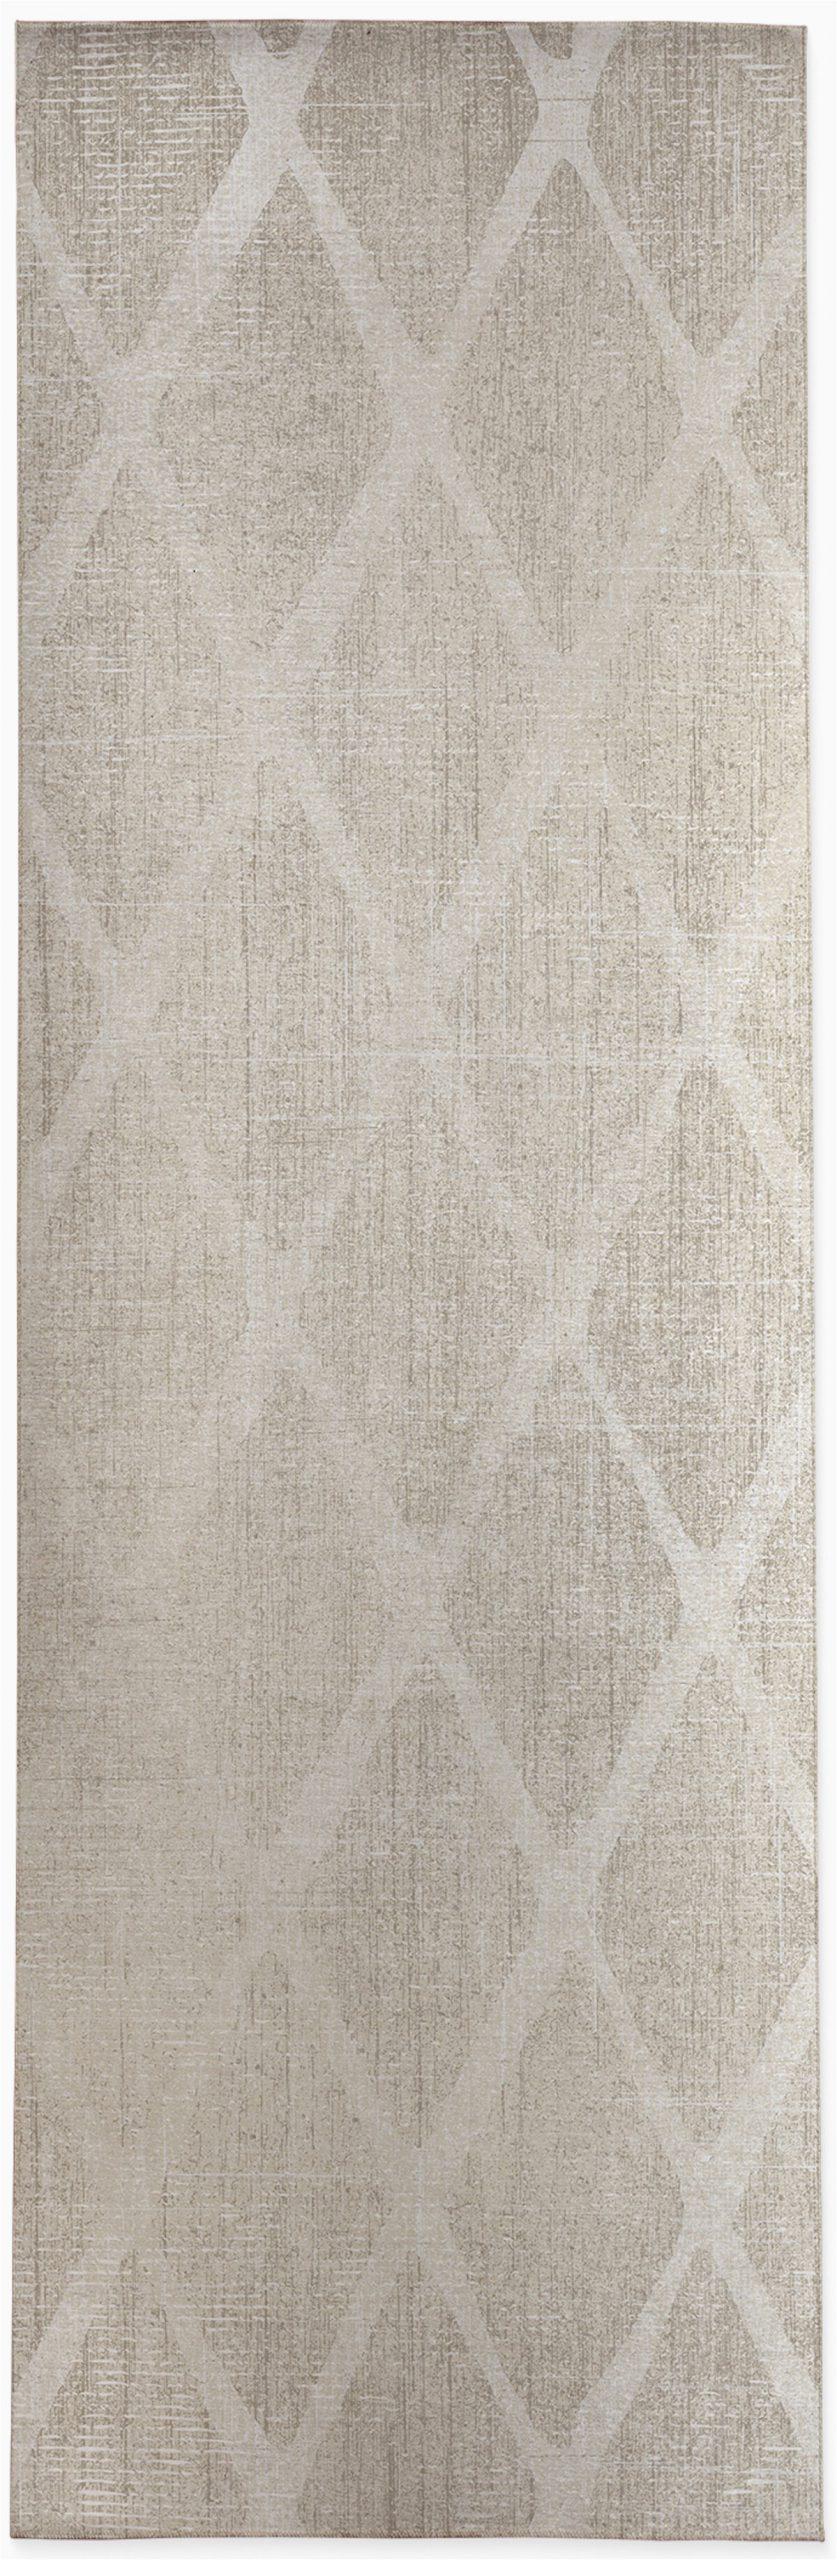 fieldston tan area rug